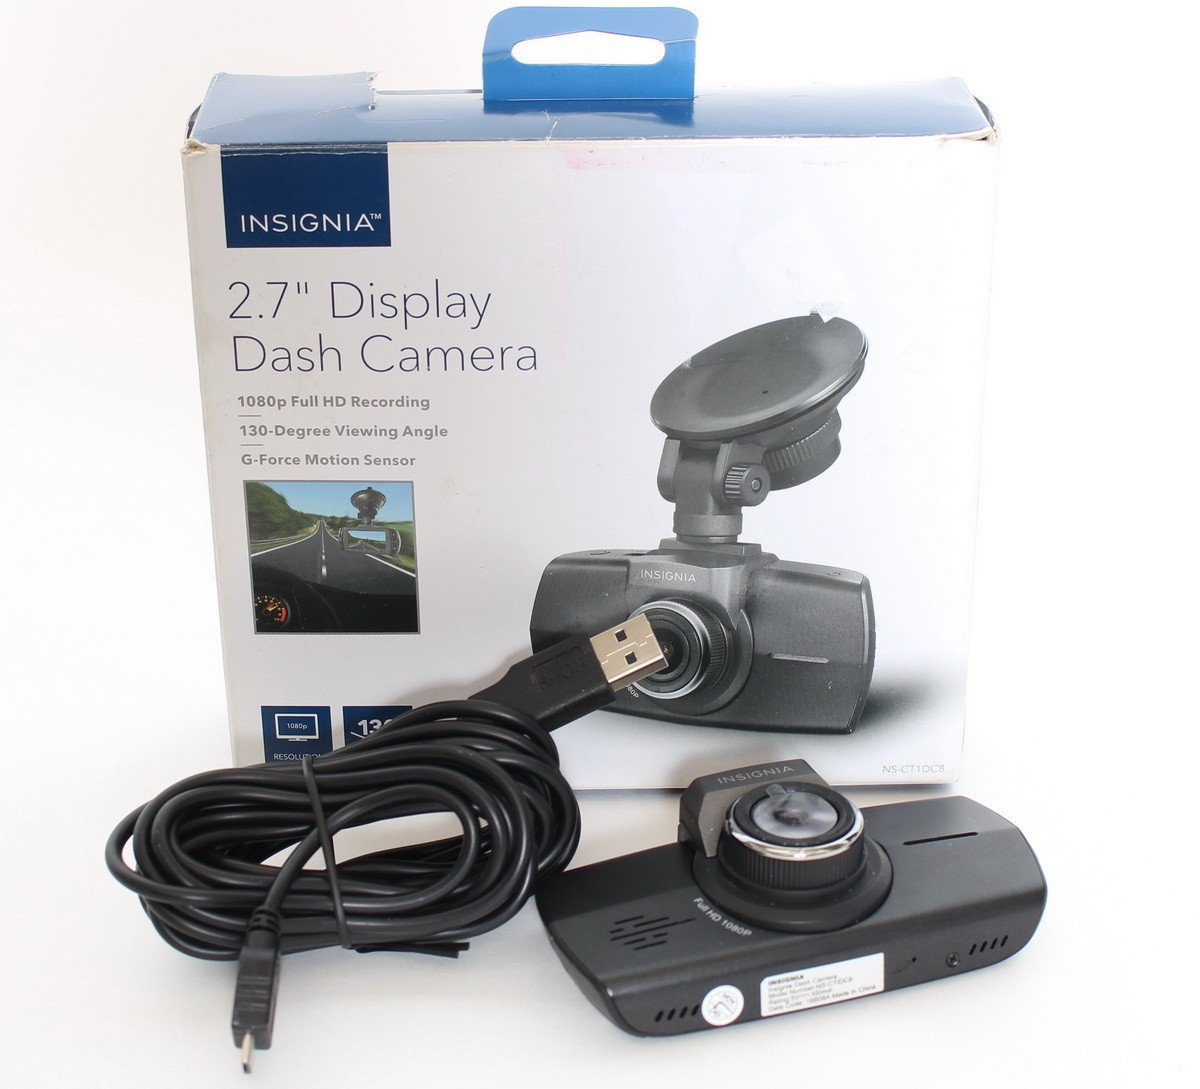 Full HD Dash Cam Black Insignia NS-CT1DC8